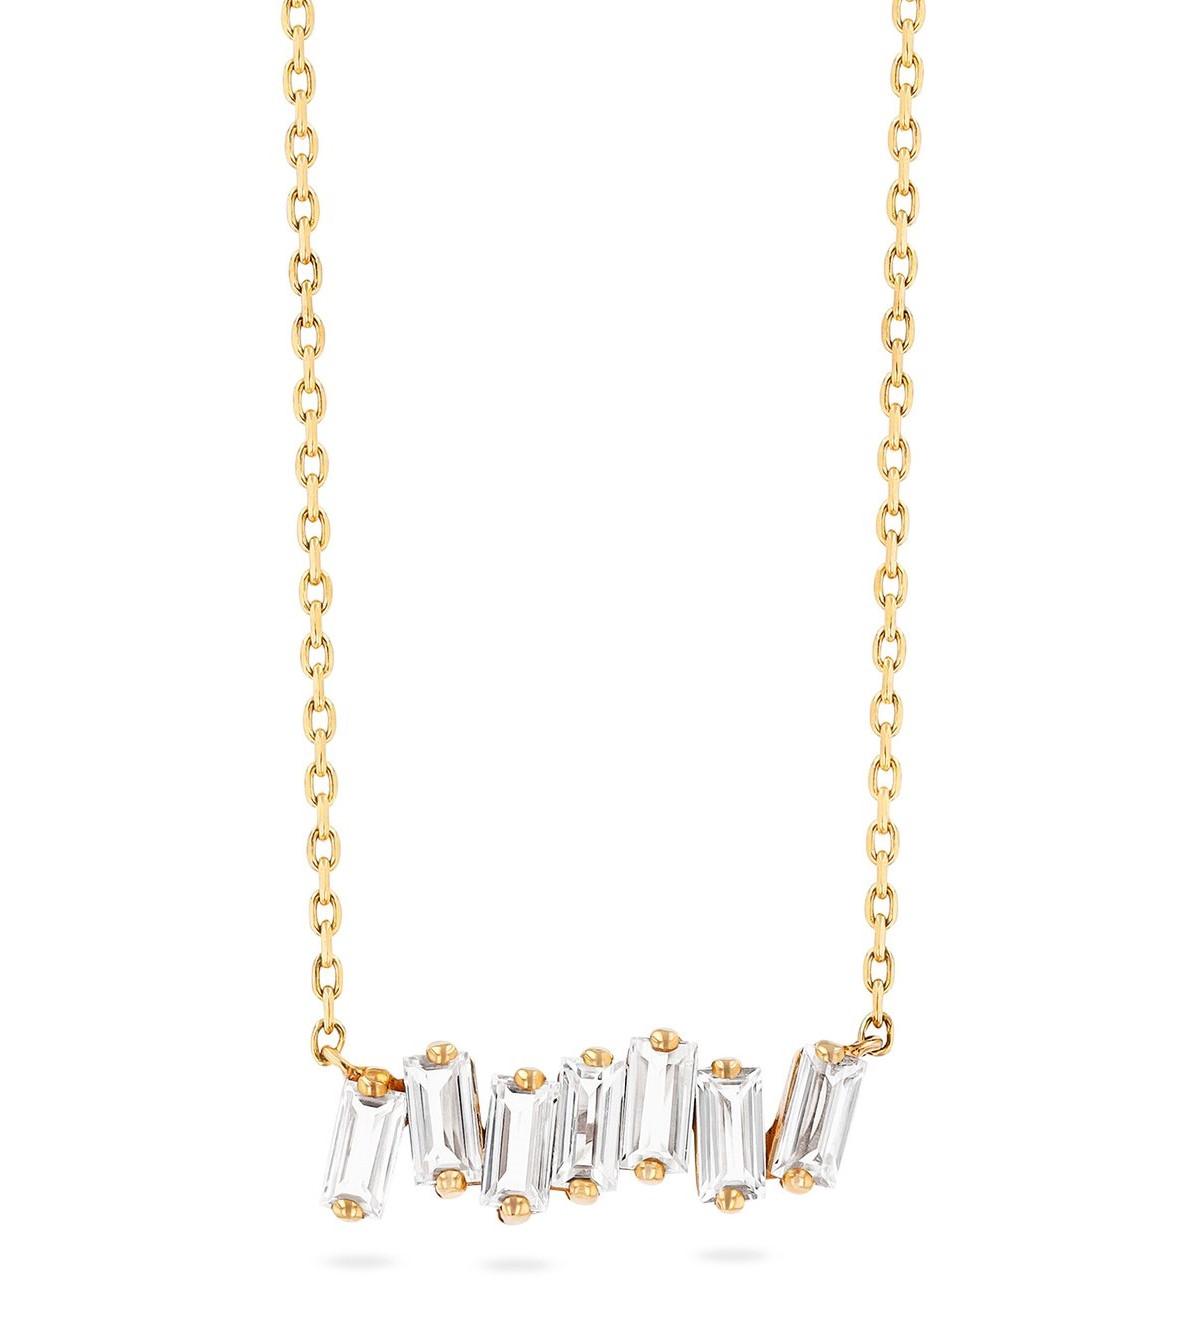 Suzanne Kalan 14K Yellow Gold White Topaz Baguette Bar Necklace